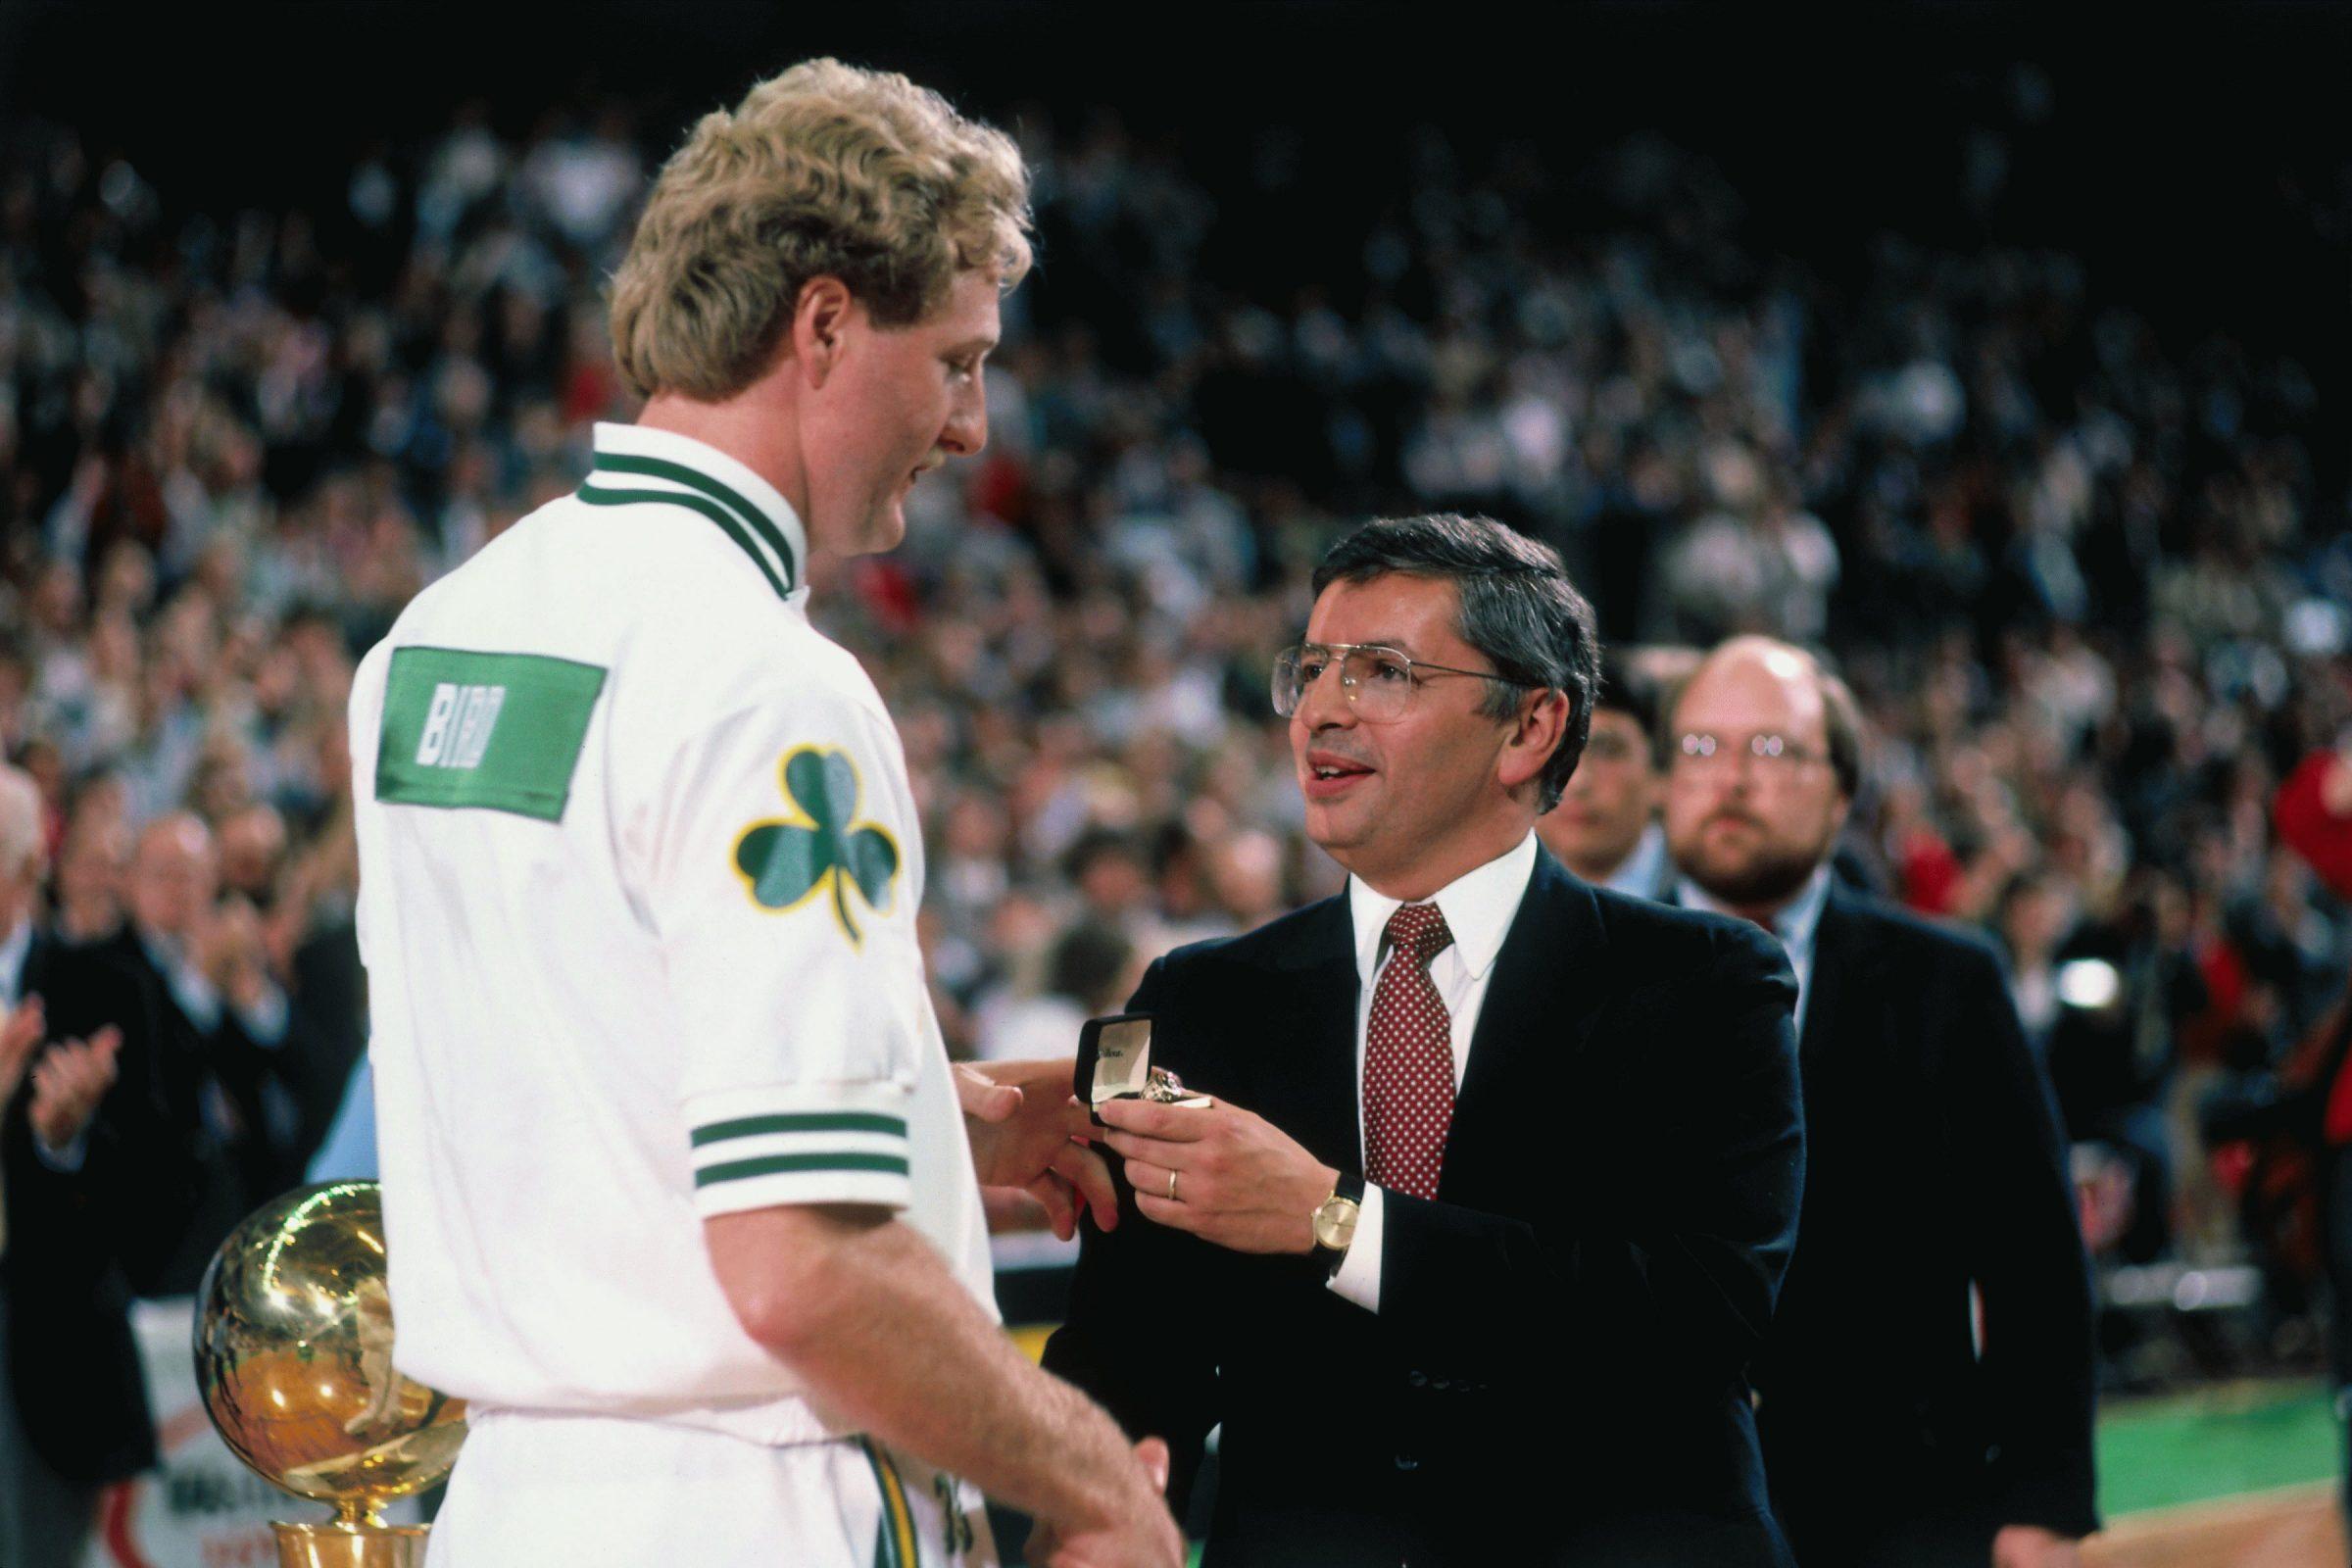 Boston Celtics 1984 Championship Ring Ceremony